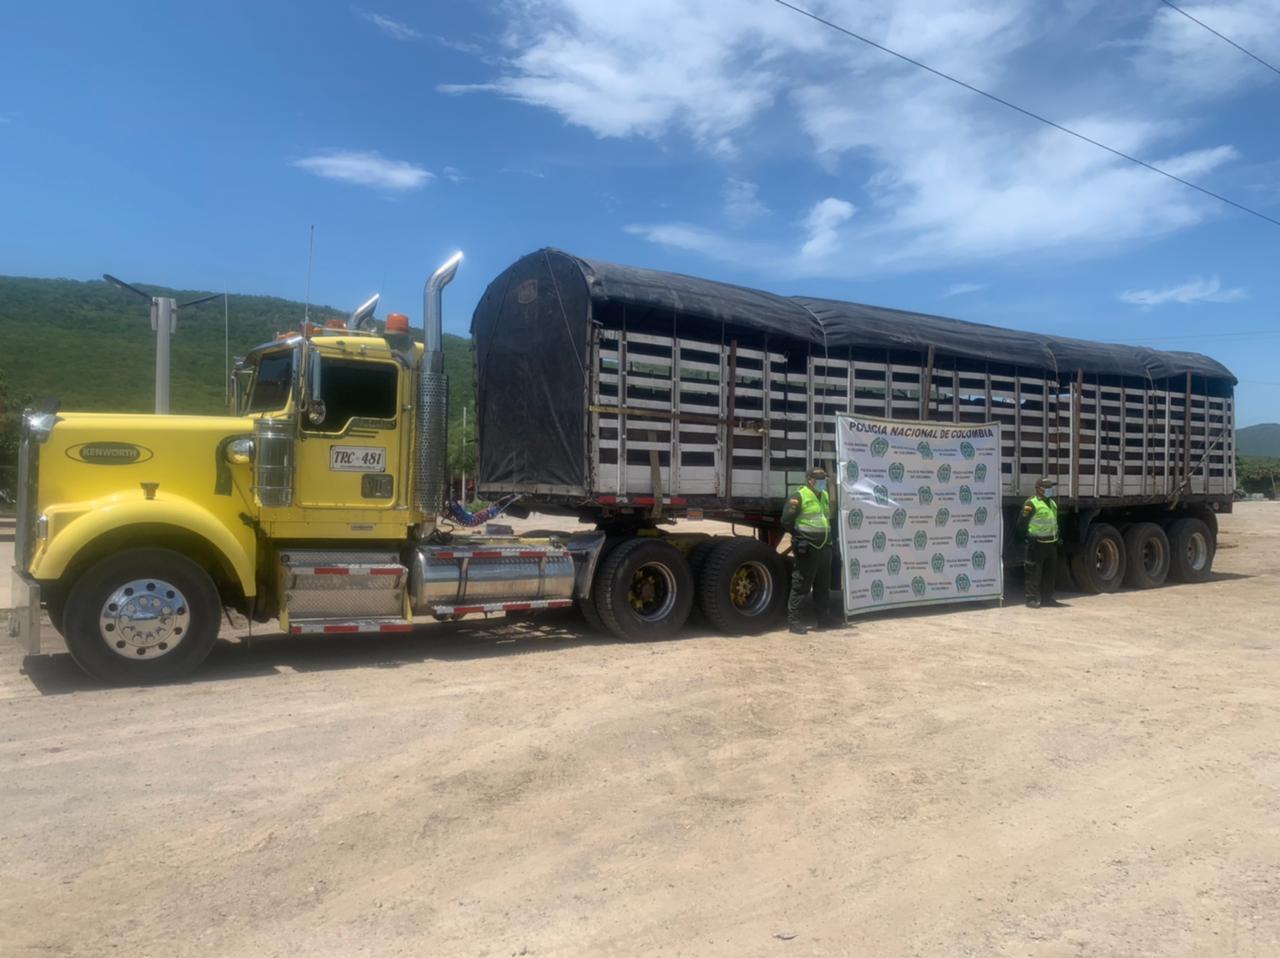 https://www.notasrosas.com/Setra decomisa mercancía por valor de 312 millones de pesos, en diferentes ejes viales de La Guajira